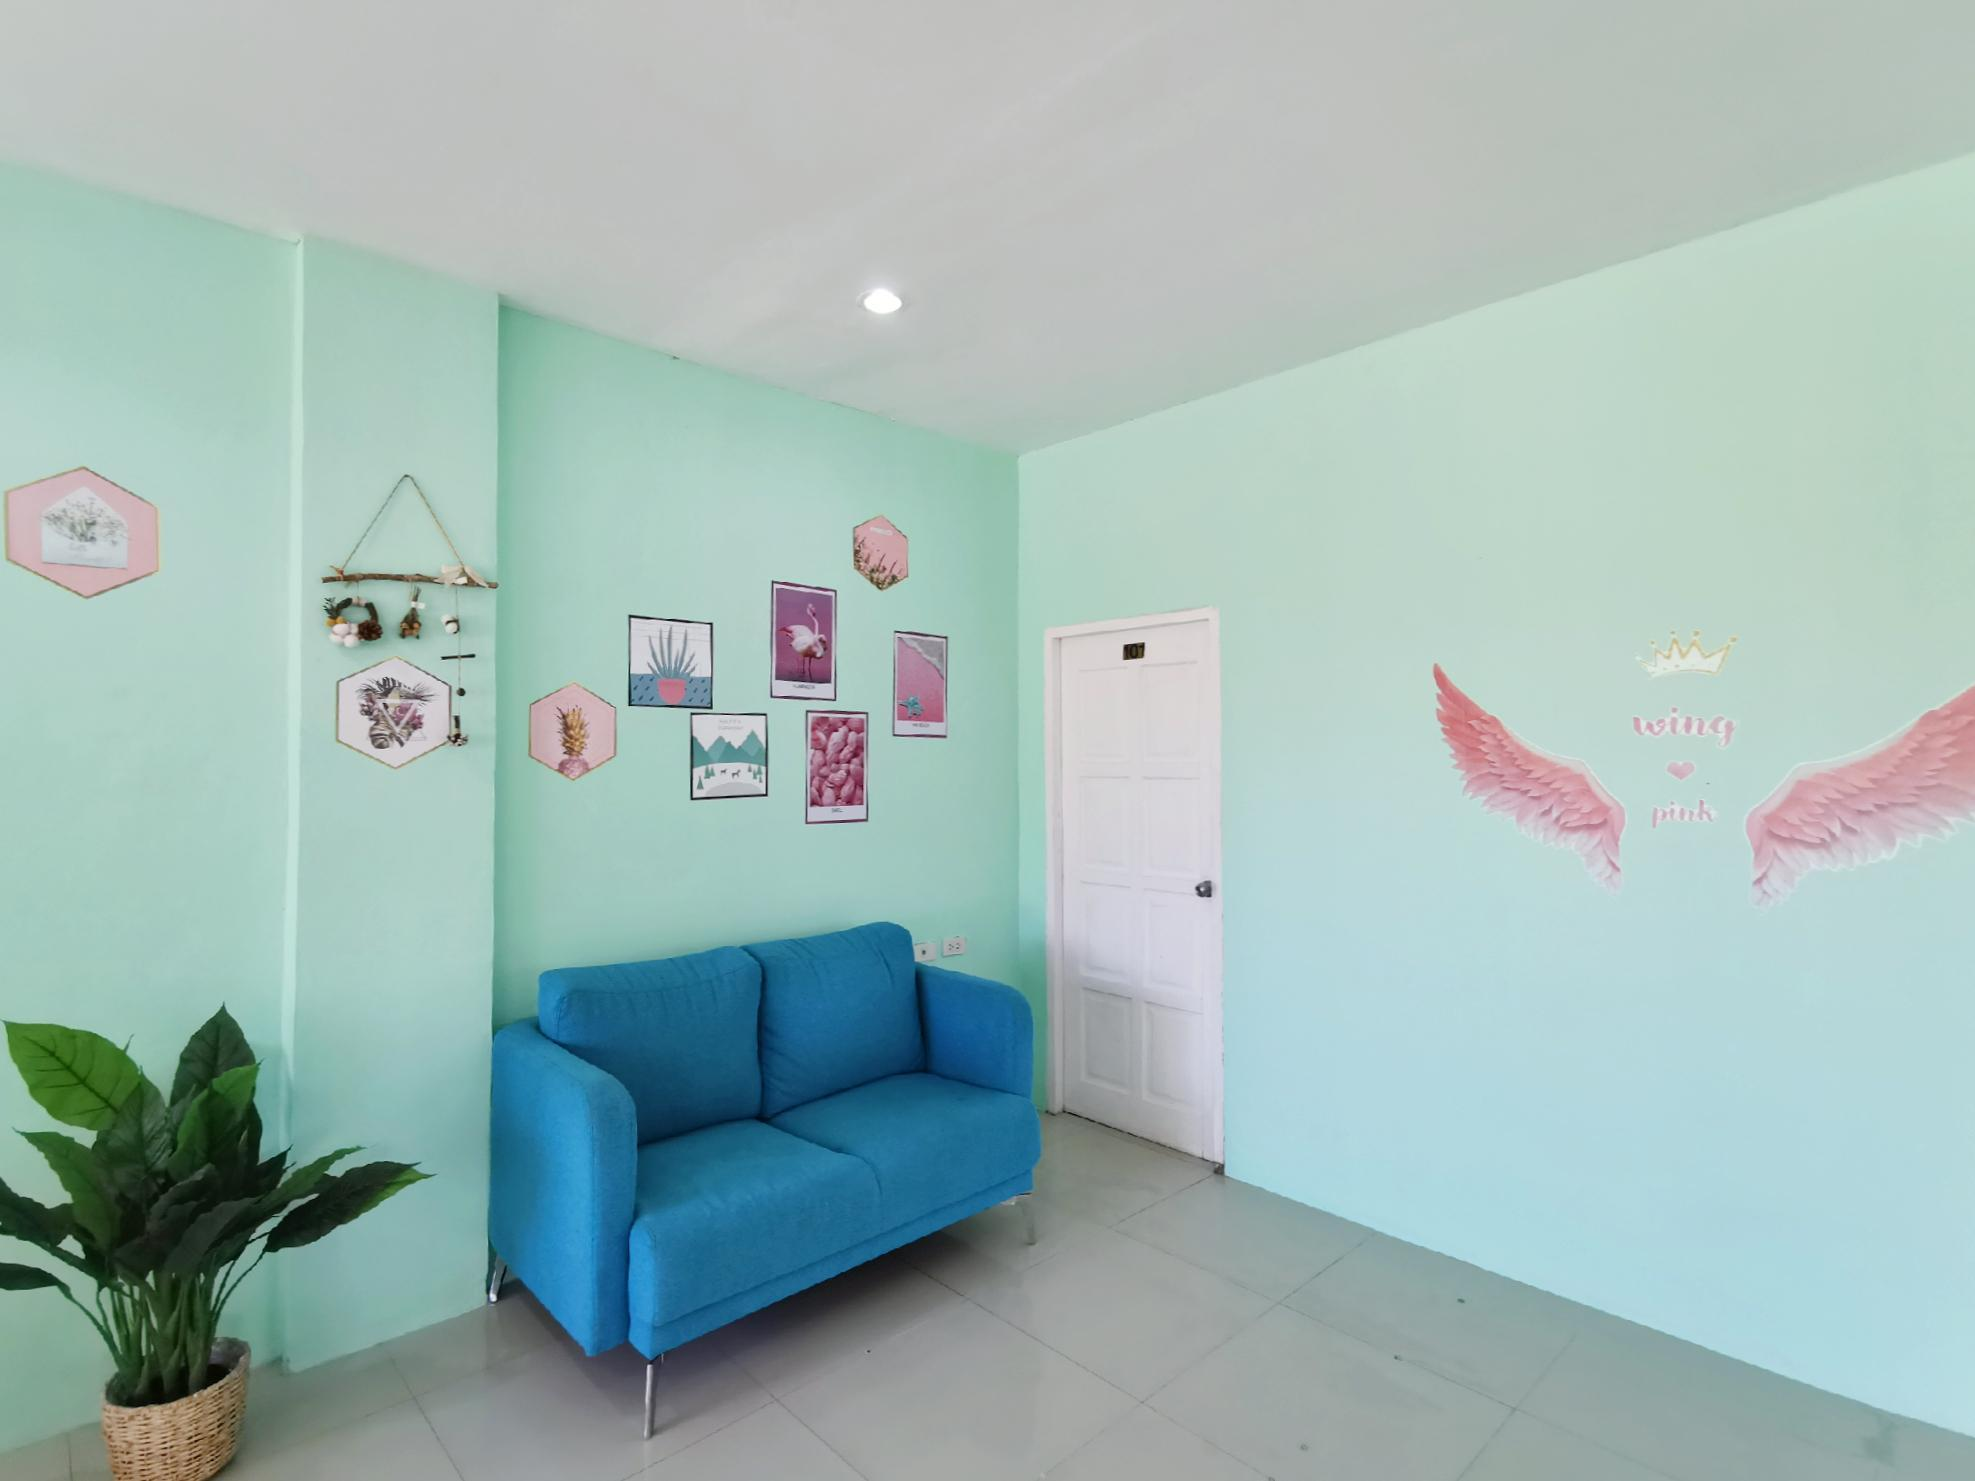 Patong Boutique King Bed Room 2 / Quiet / Clean อพาร์ตเมนต์ 1 ห้องนอน 1 ห้องน้ำส่วนตัว ขนาด 30 ตร.ม. – ป่าตอง